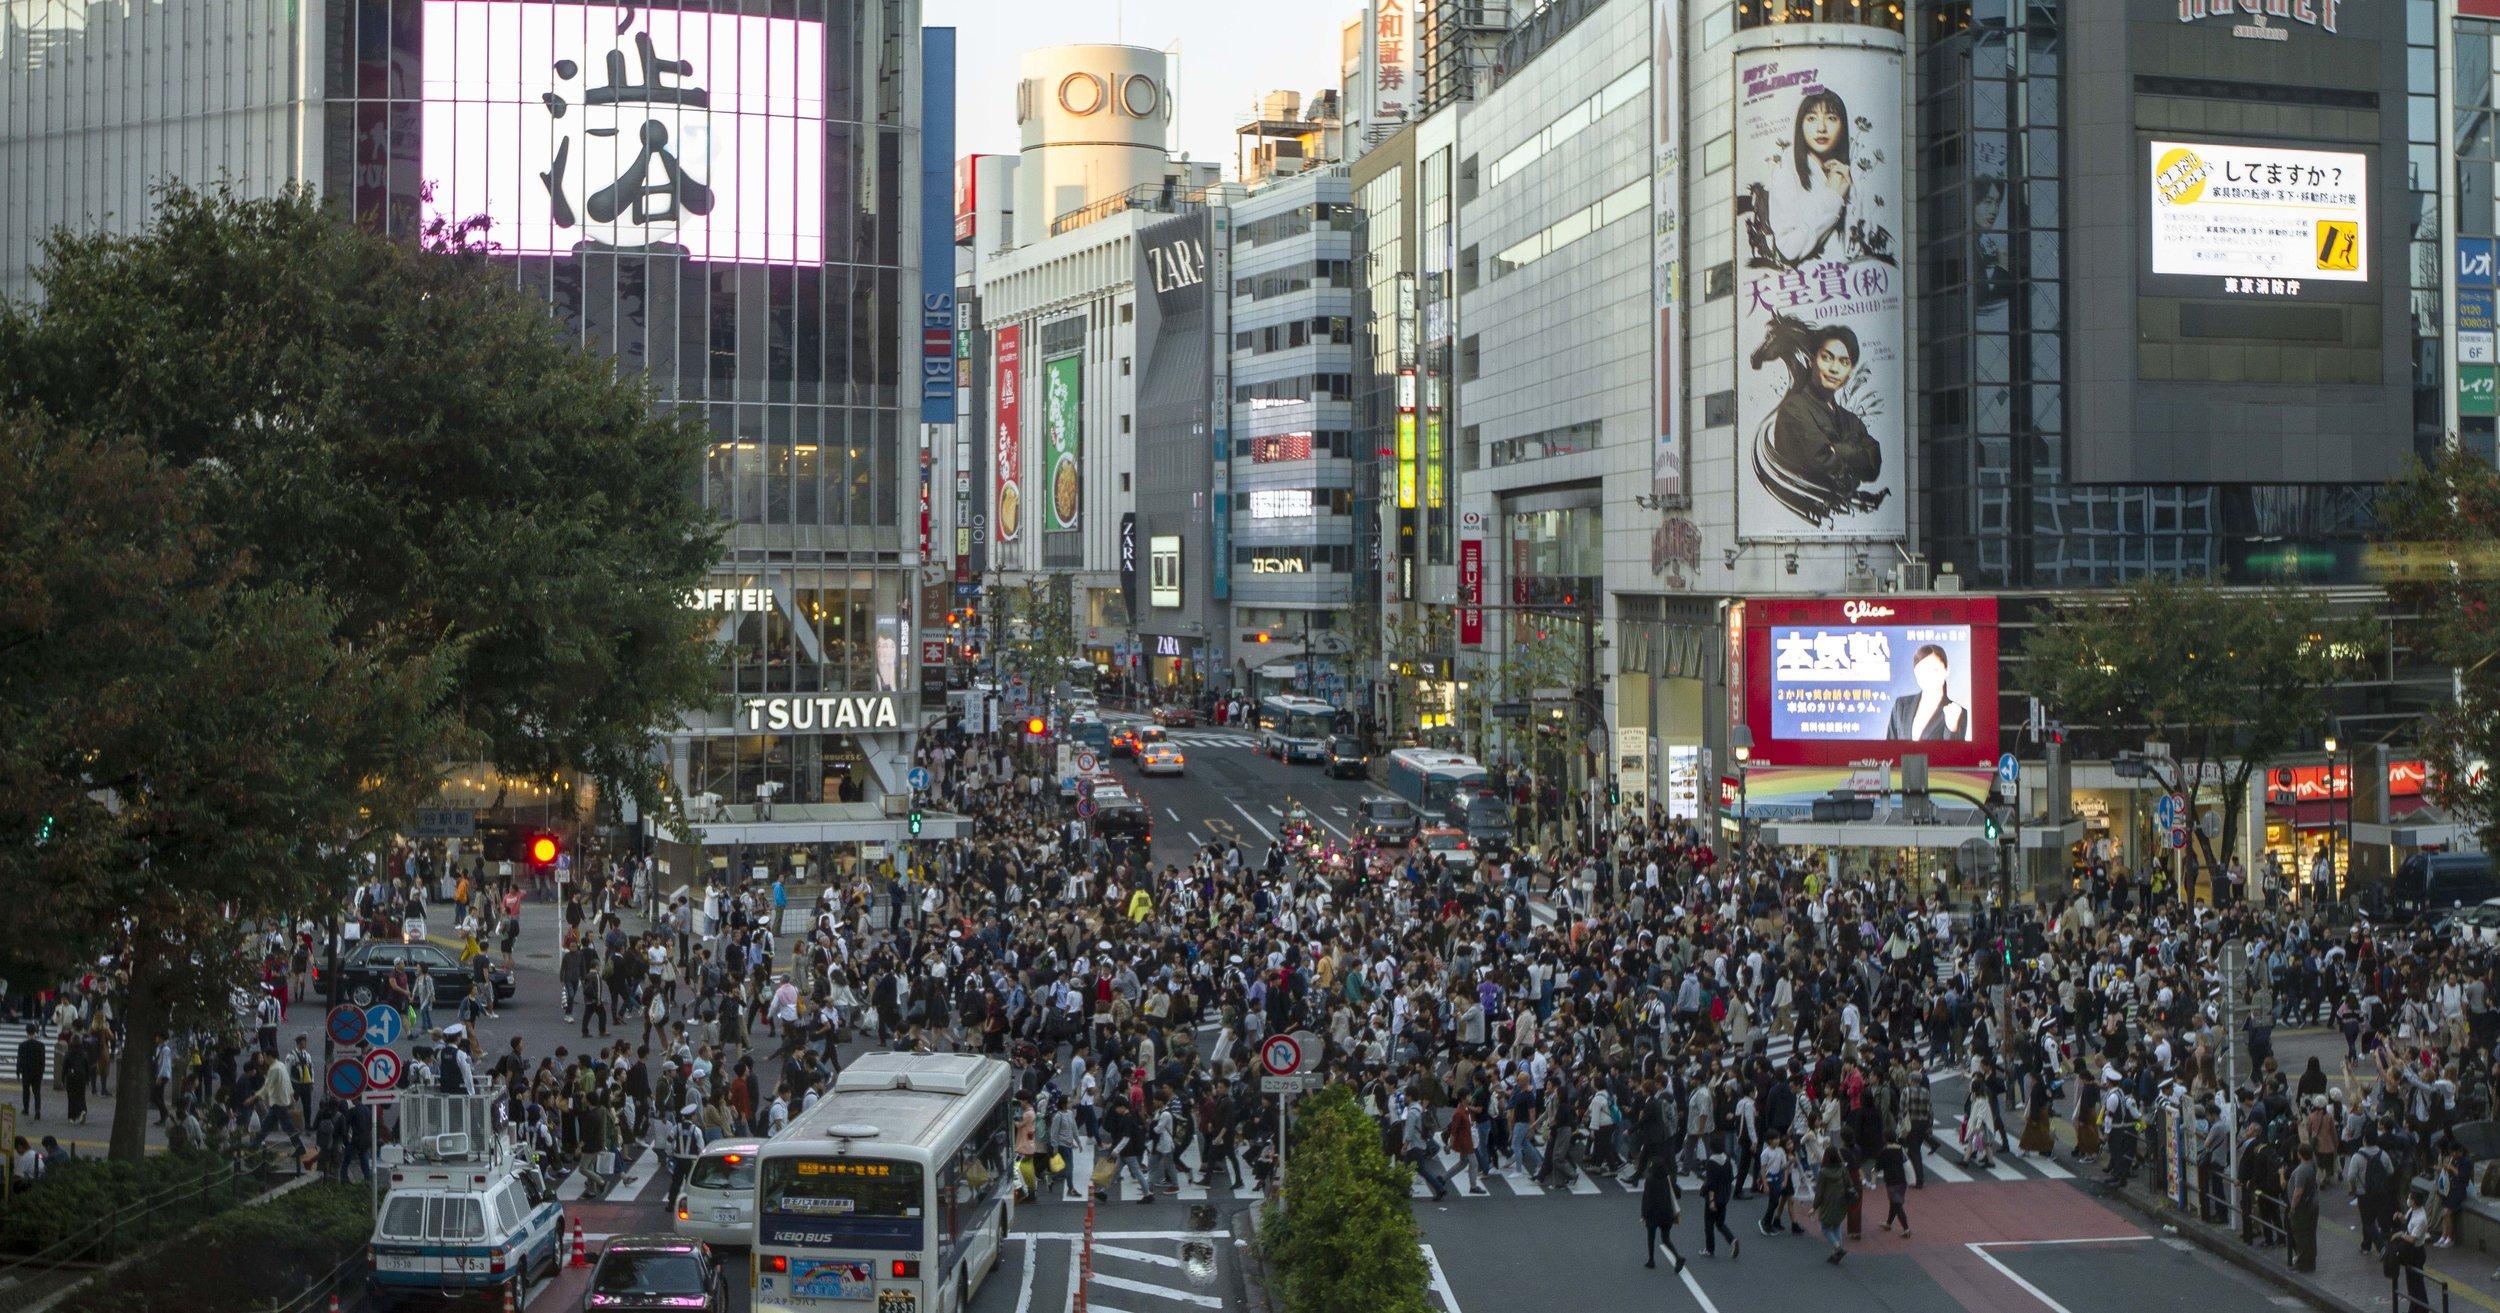 Shibuya Crossing from the train station.